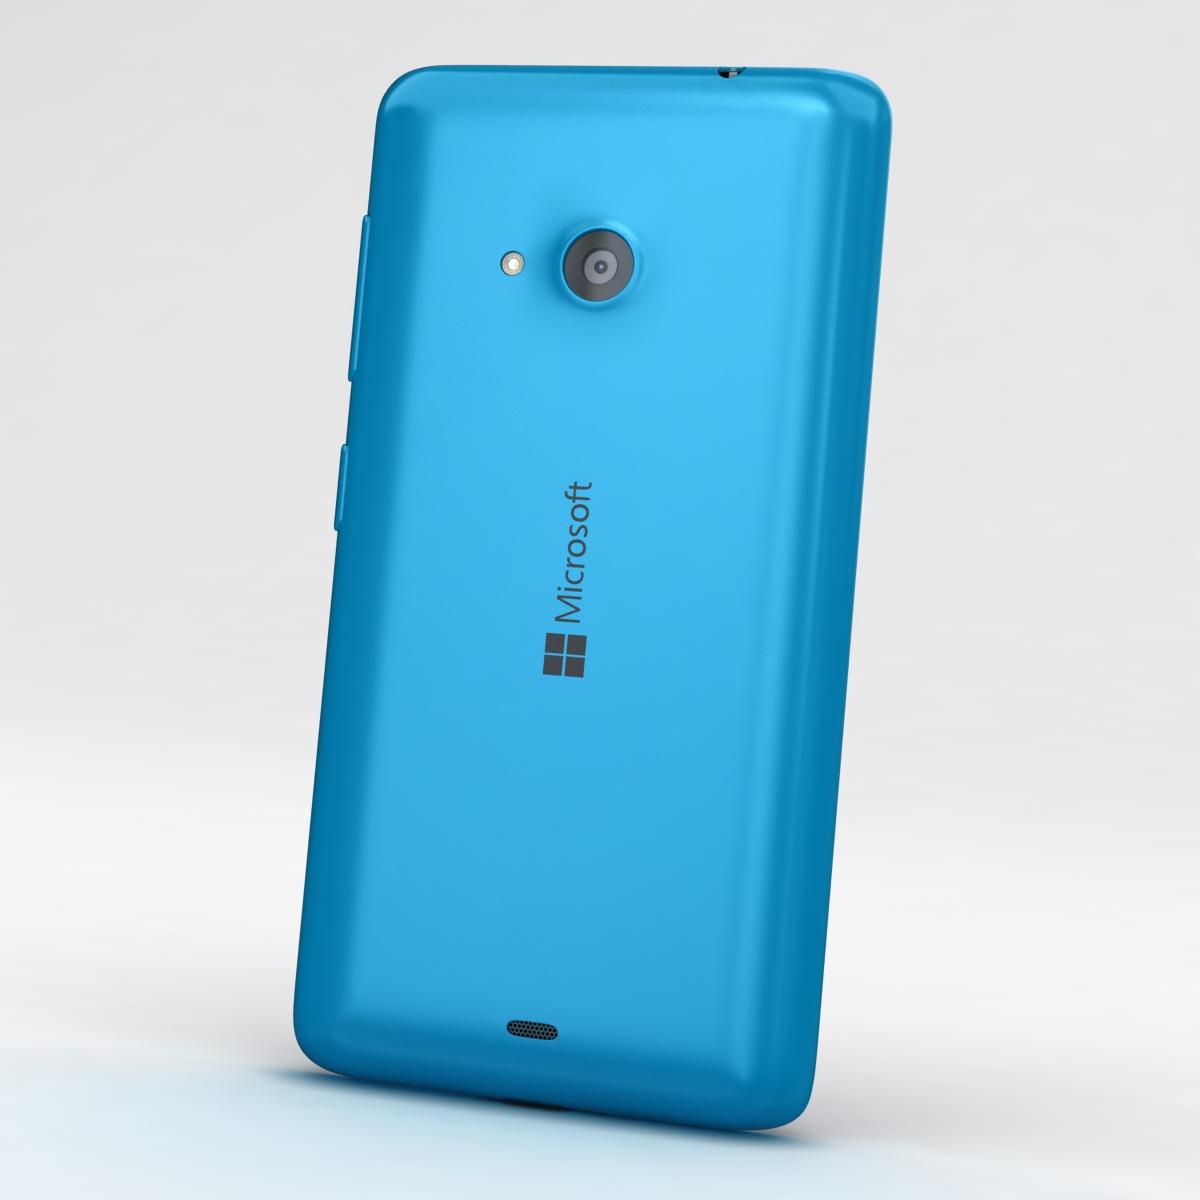 microsoft lumia 535 and dual sim blue 3d model 3ds max fbx c4d obj 204524